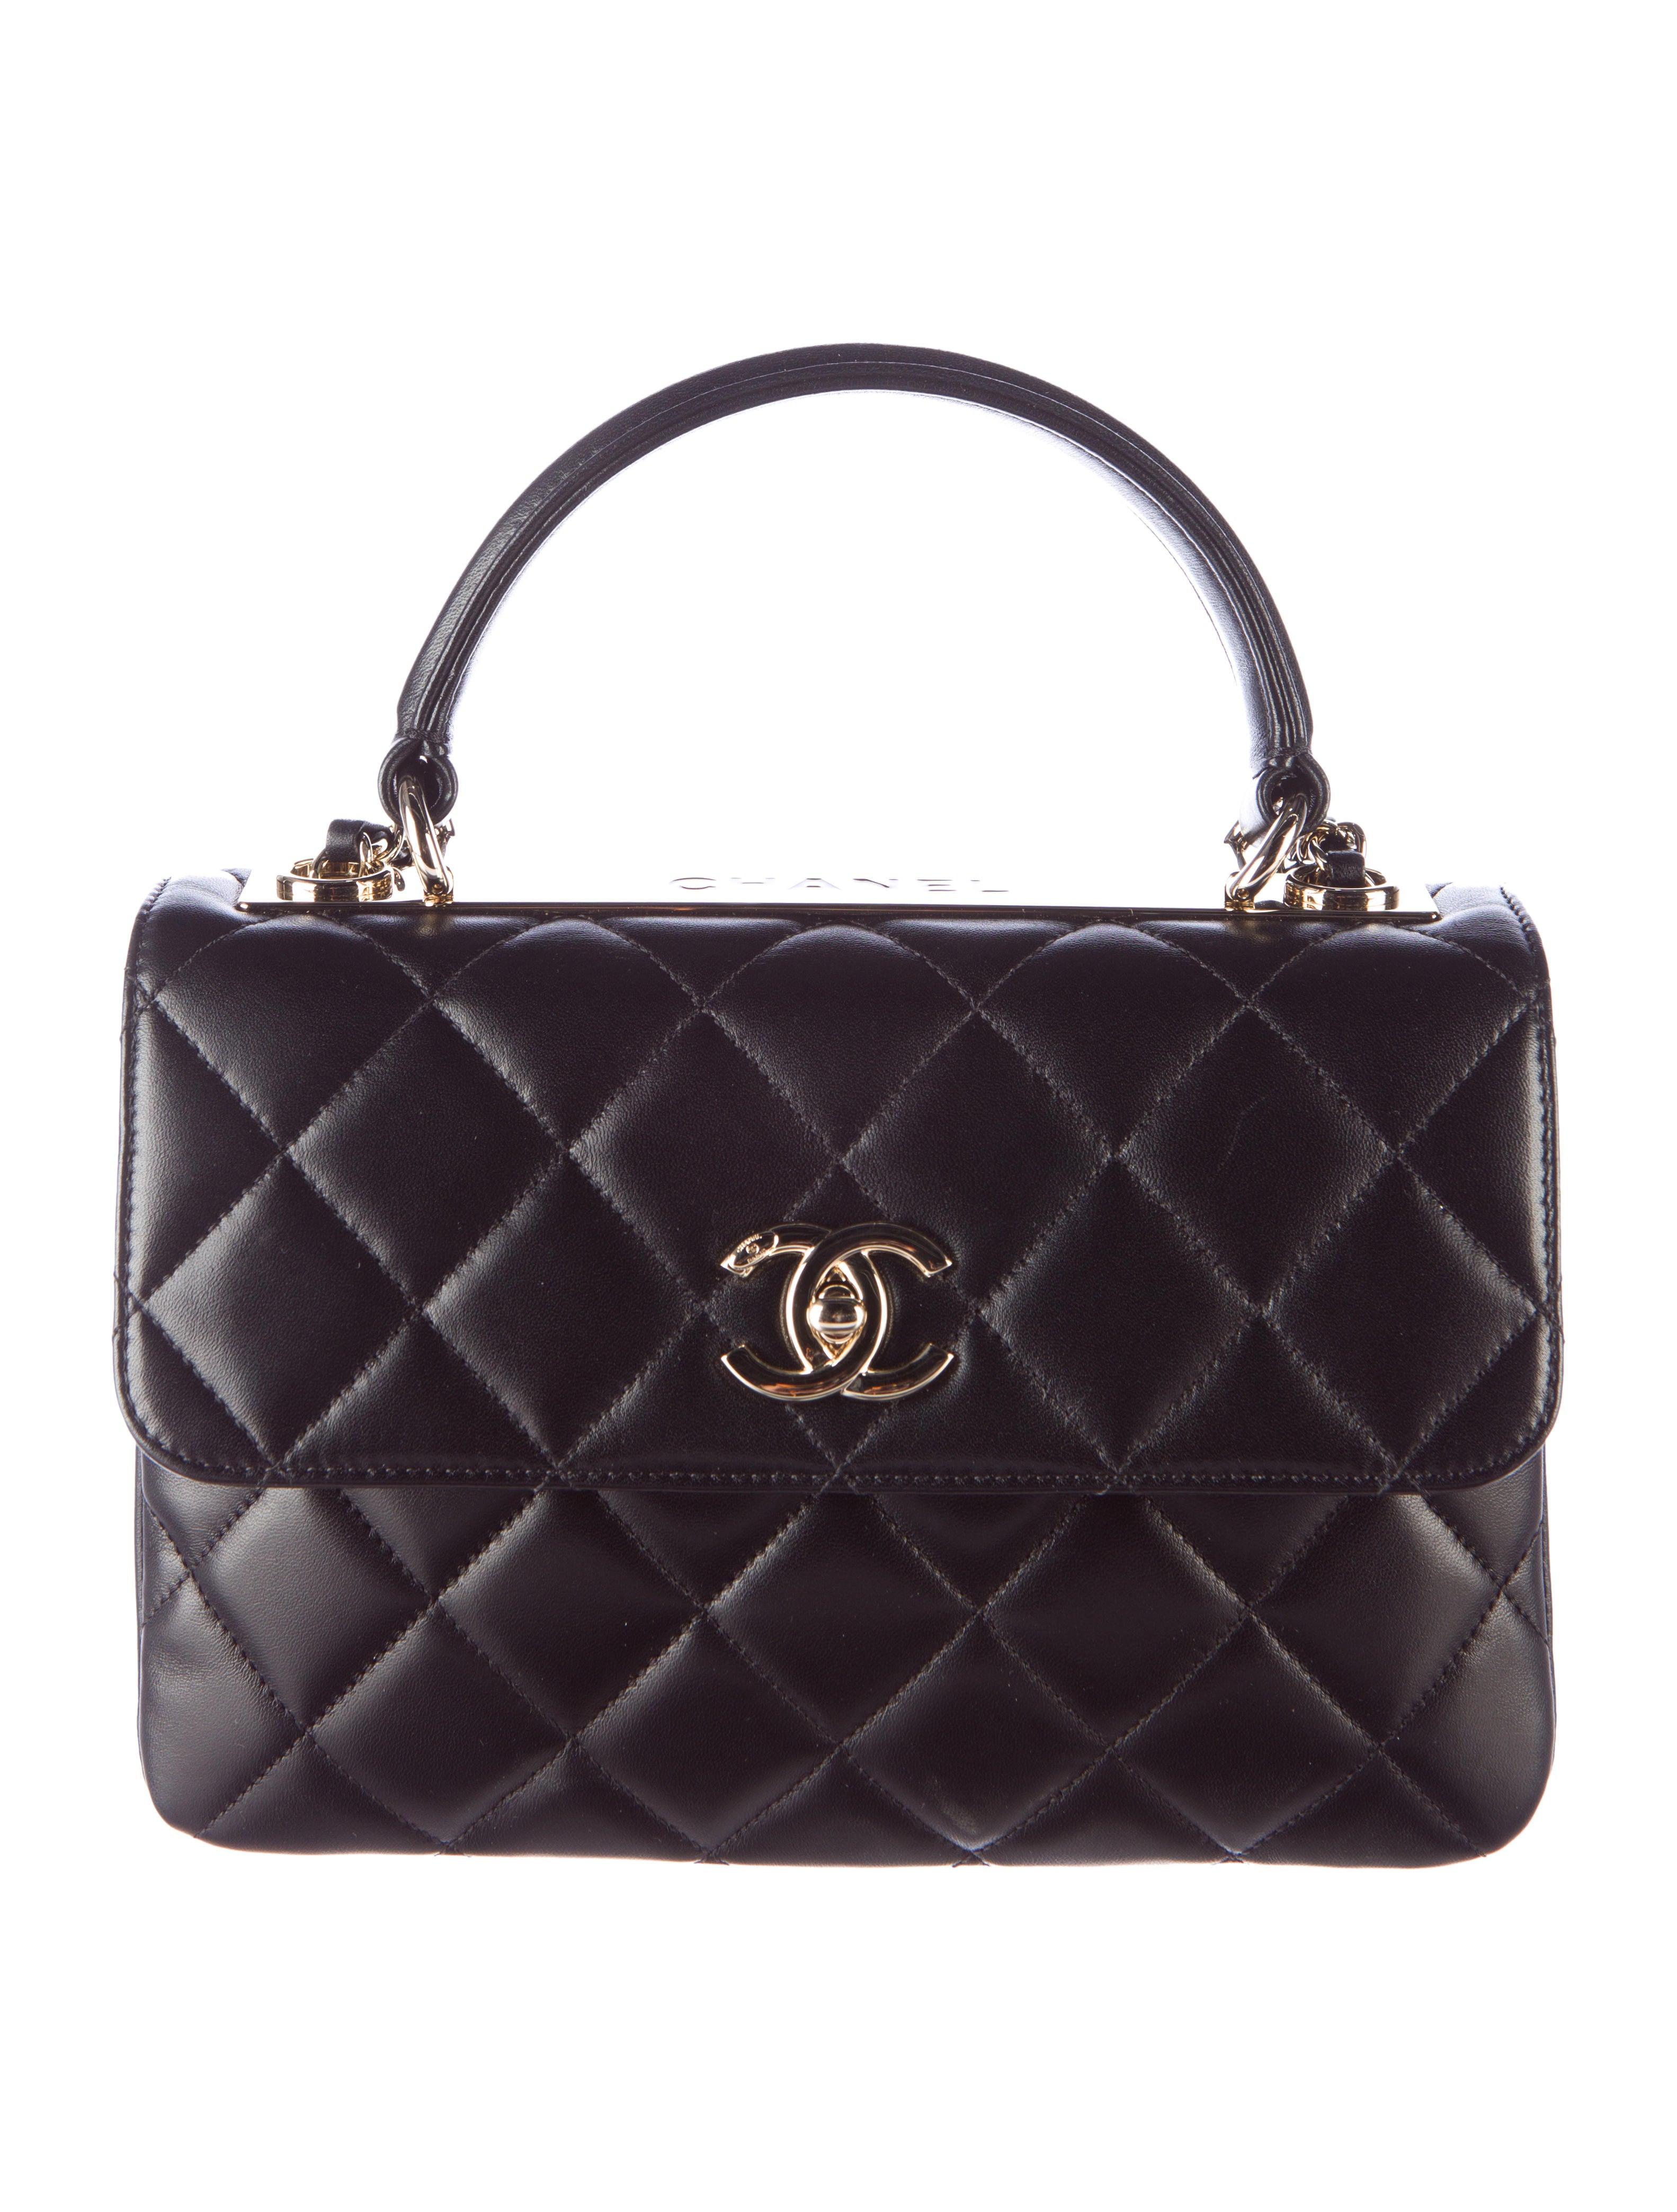 f8fceb165c1d80 Chanel Trendy CC Small Flap Bag - Handbags - CHA112016 | The RealReal